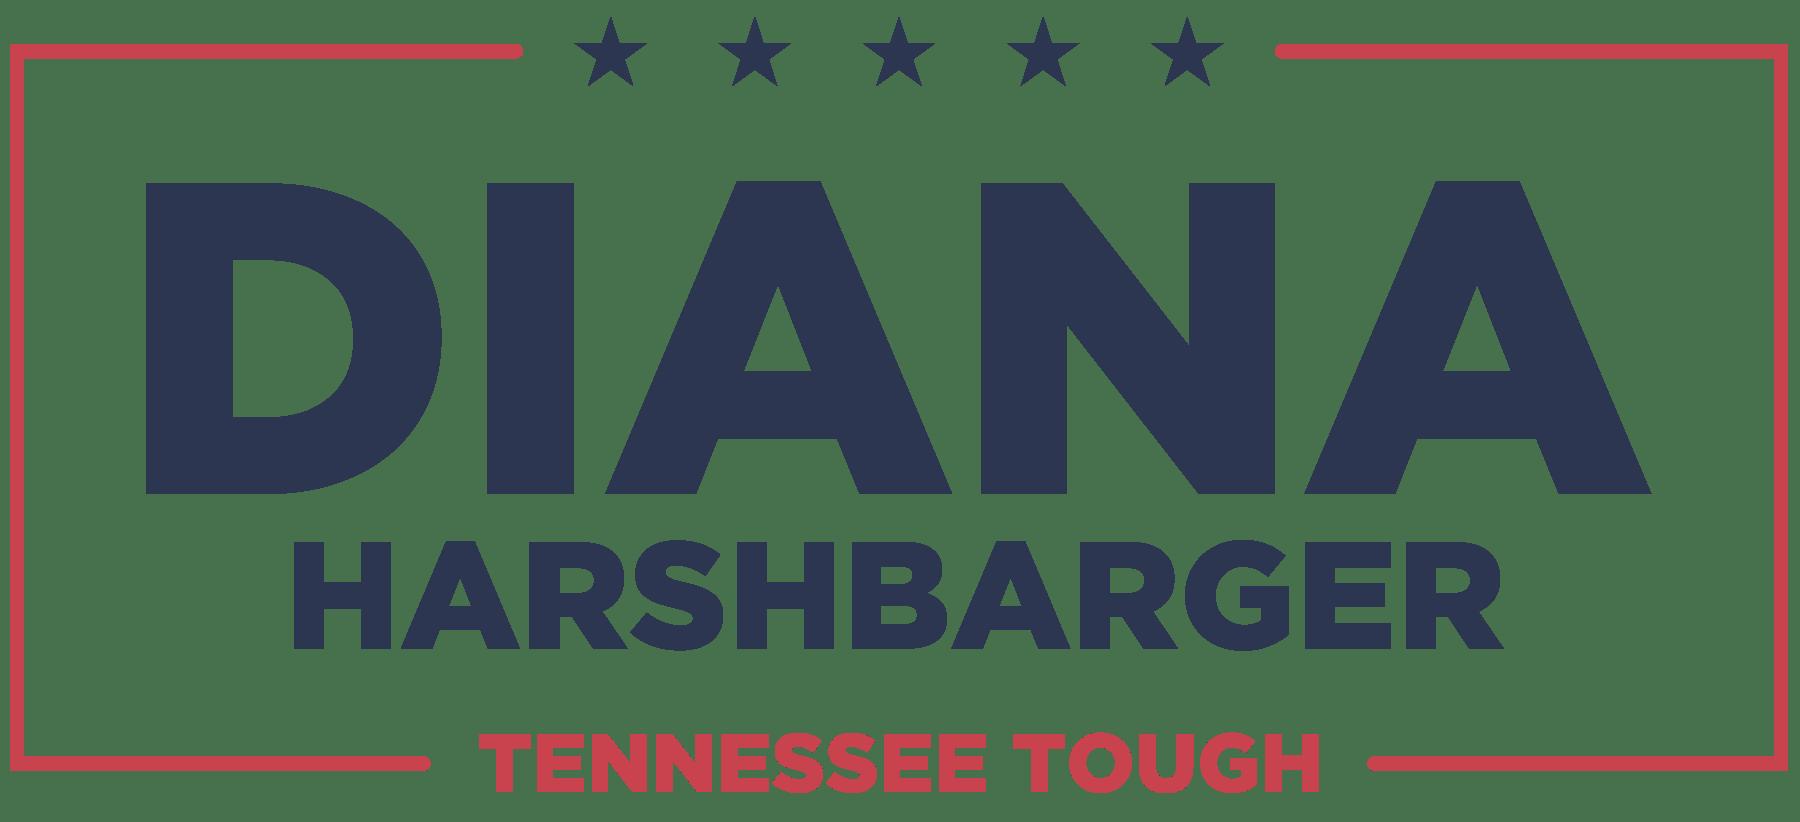 Harshbarger logo